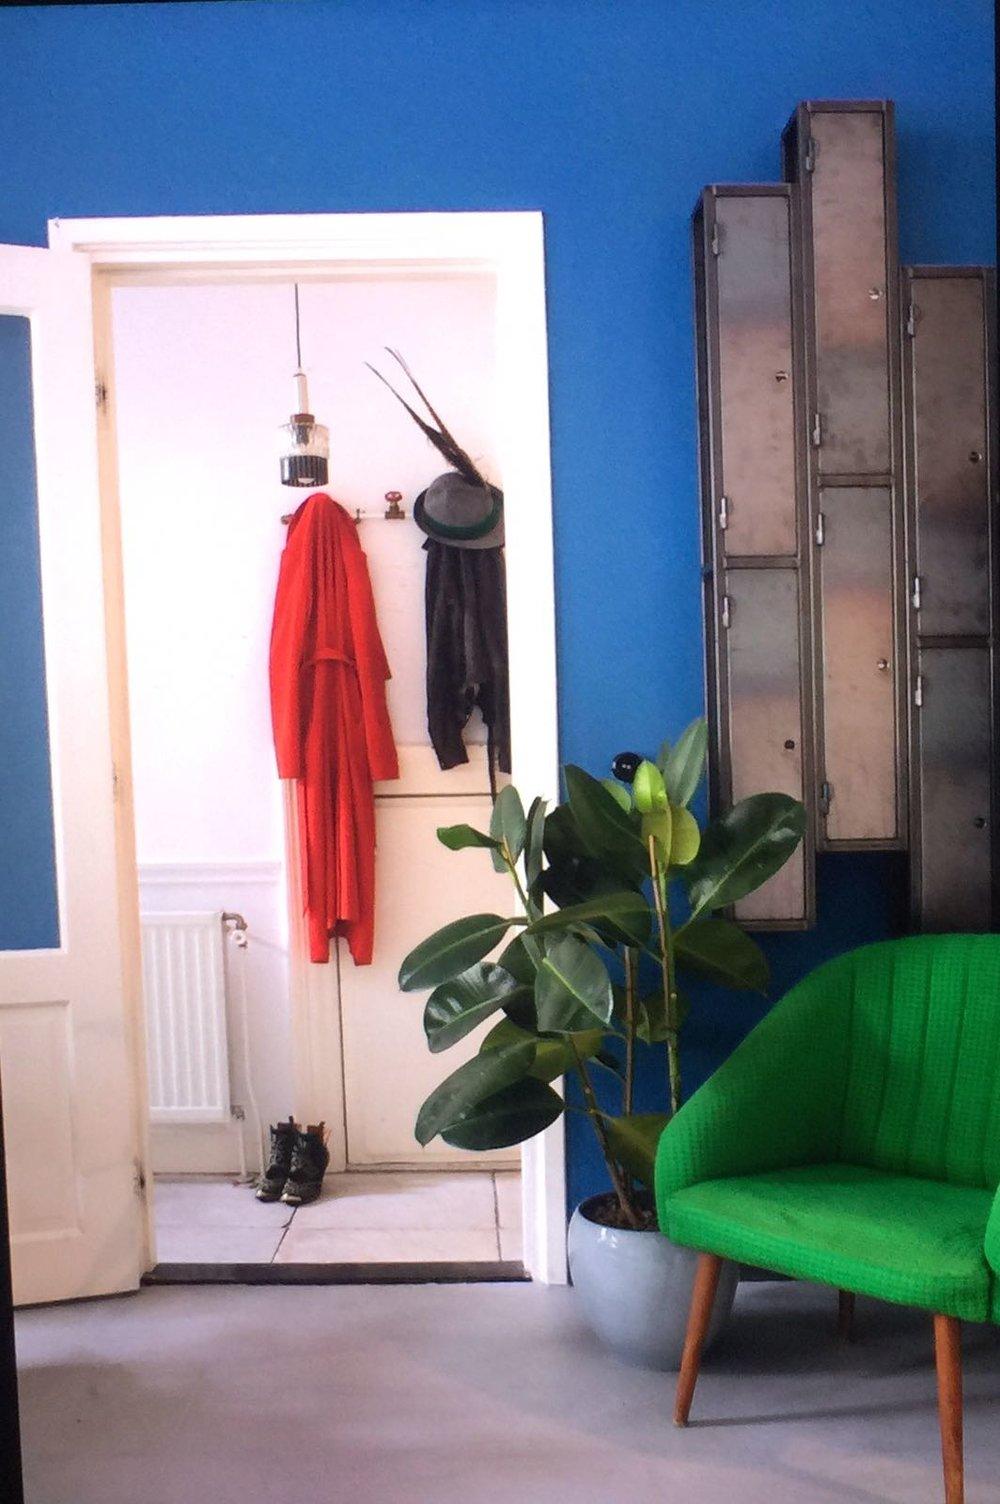 StudioNoun-InteriorDesignProject-PrivateHome-Amsterdam19.jpeg